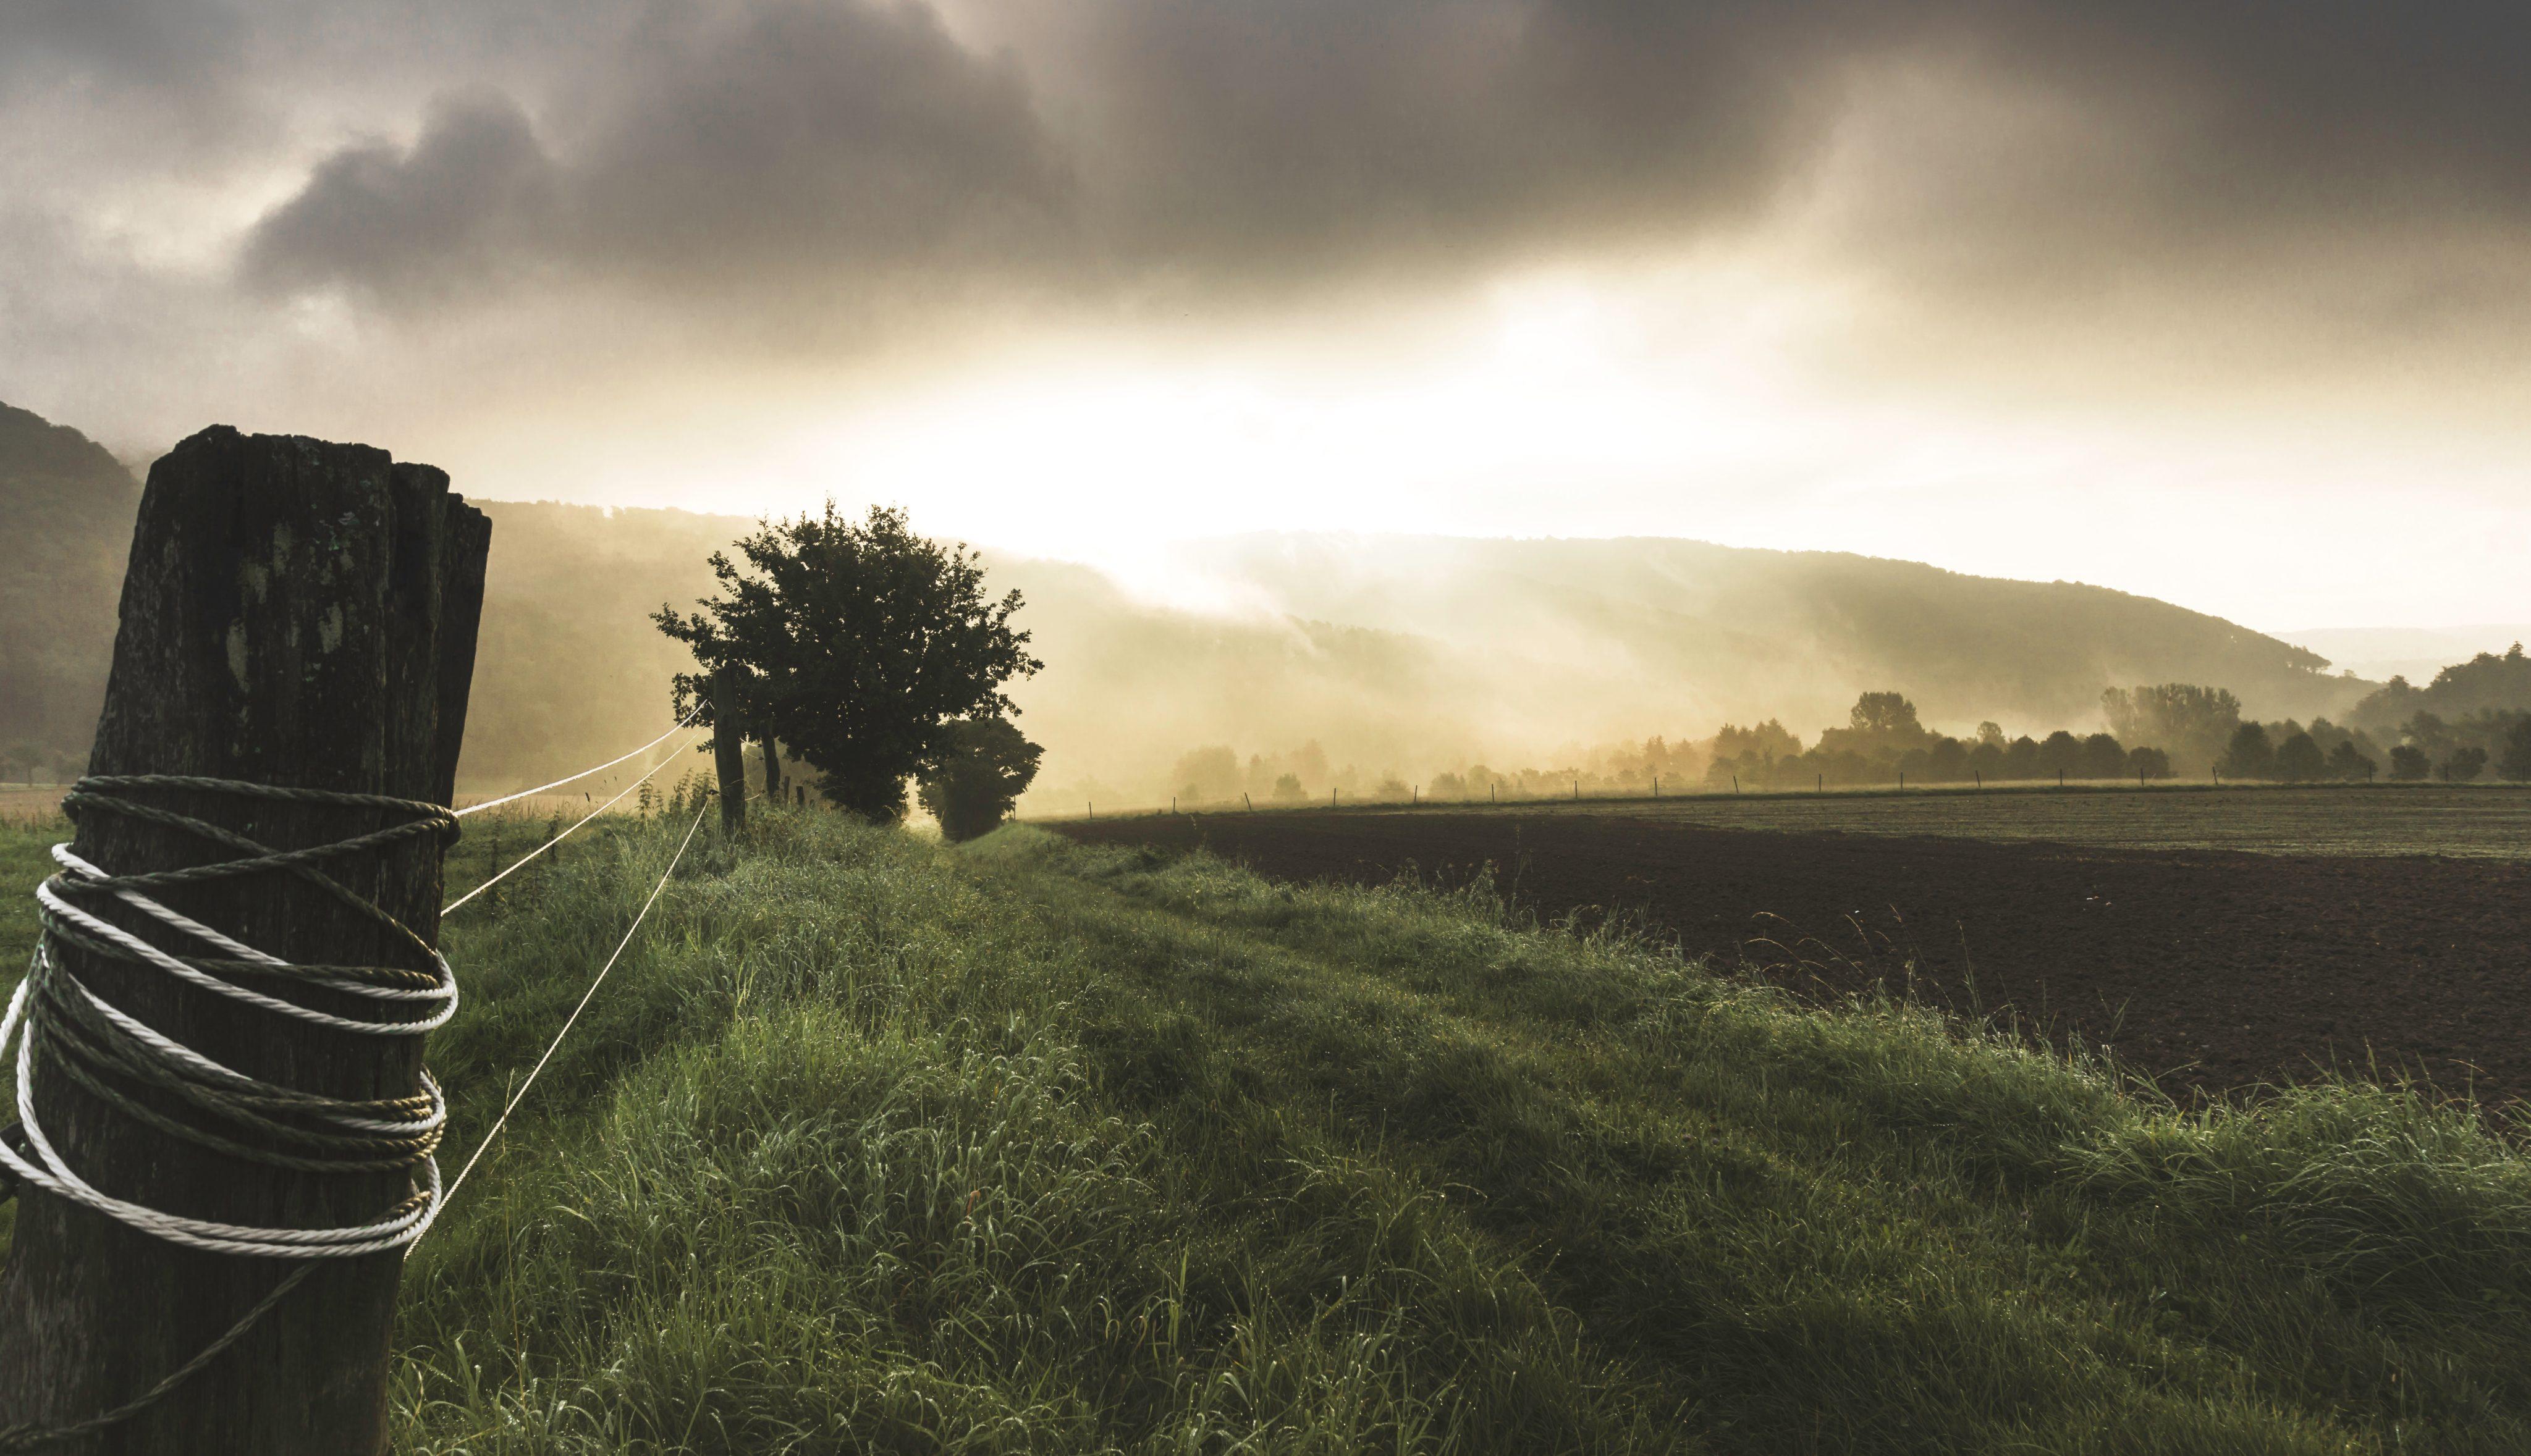 fence, rural, field